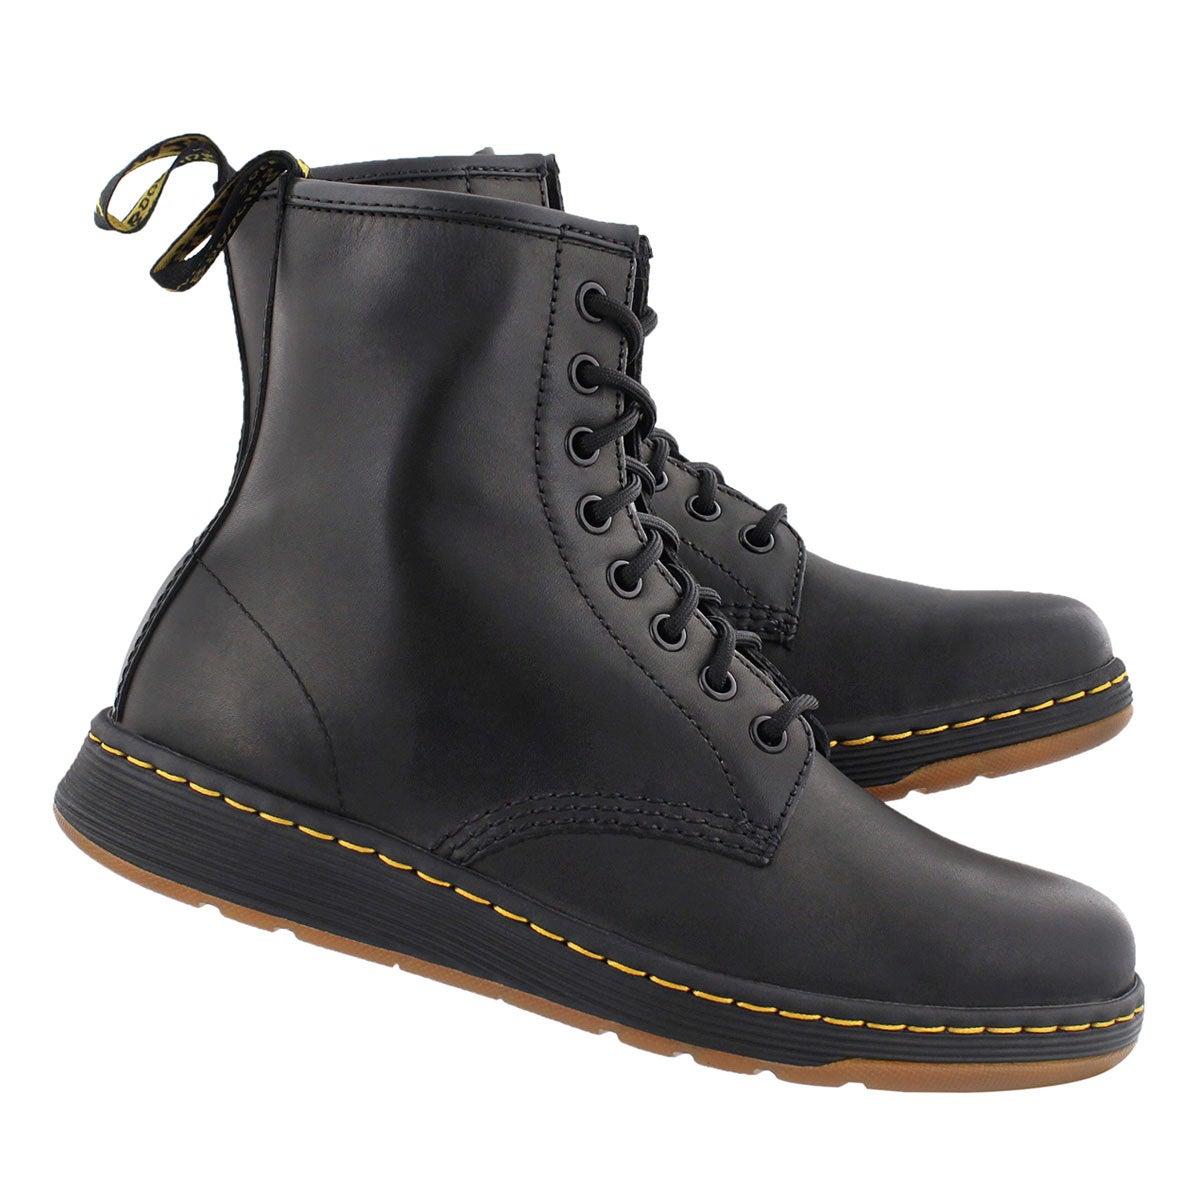 Mns Lite Newton blk 8 eye combat boot